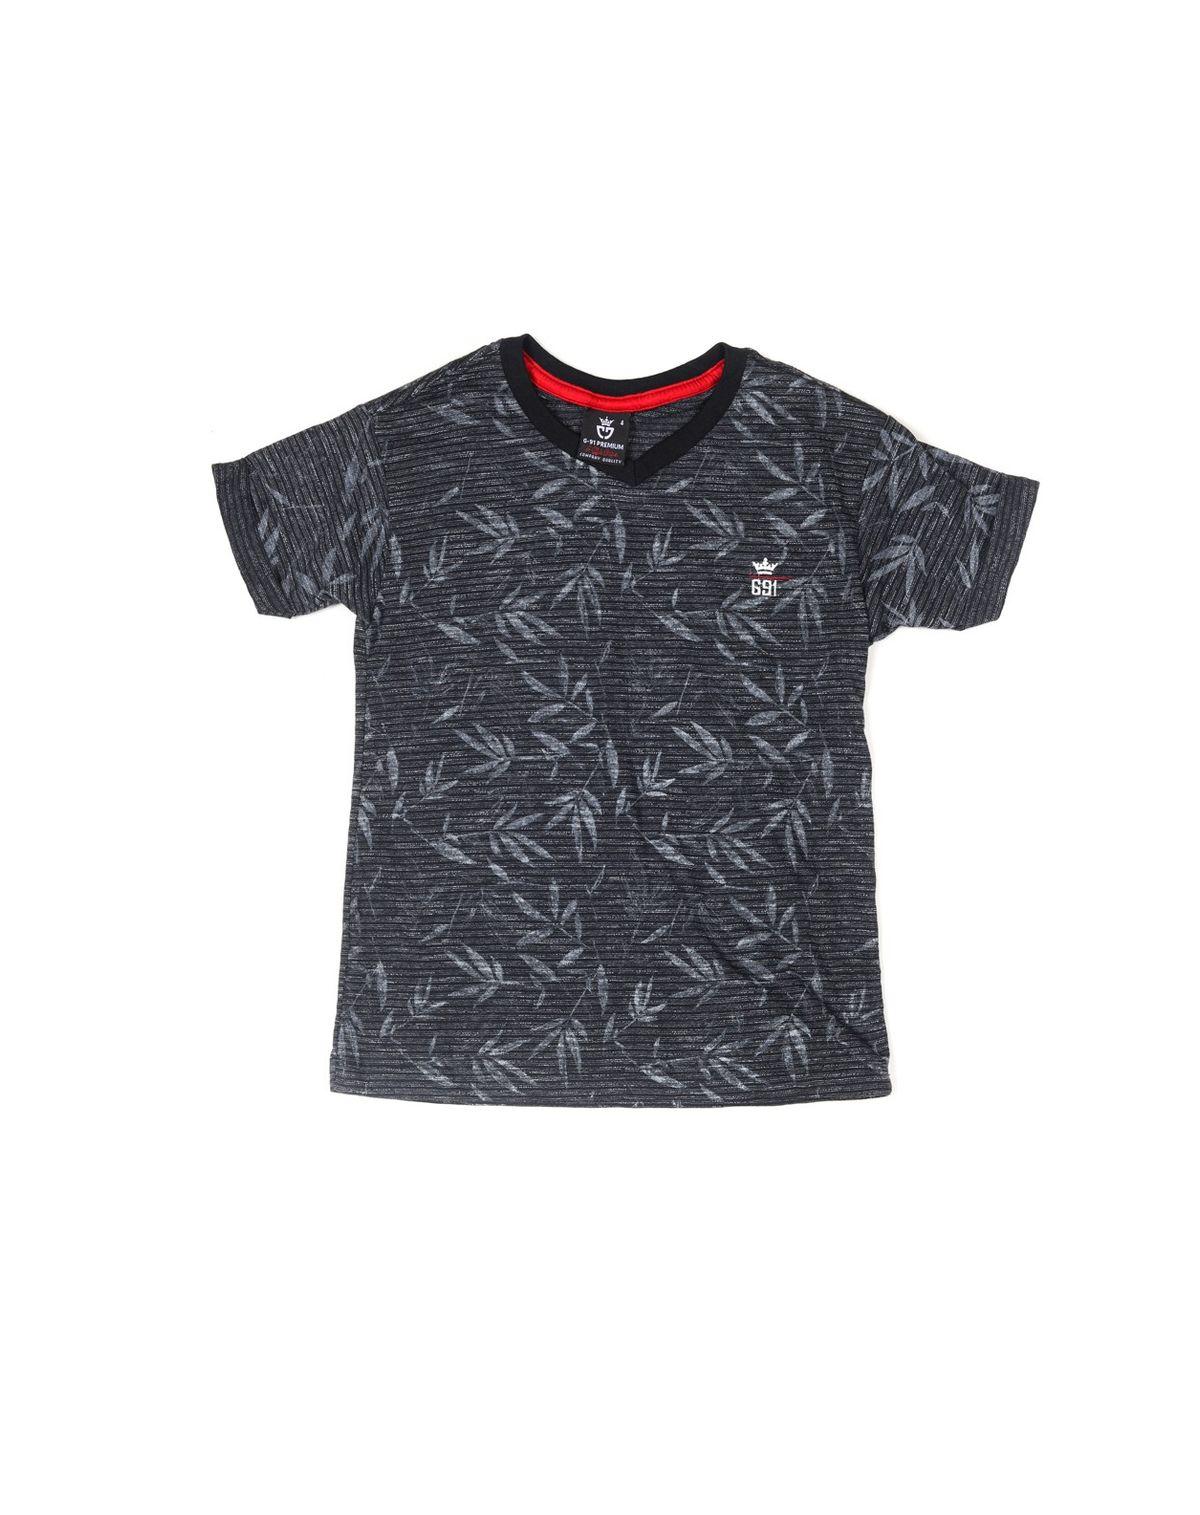 2050005688640-Camiseta-Manga-Curta-Infantil-Menino-Folhagens-PRETO-6-1